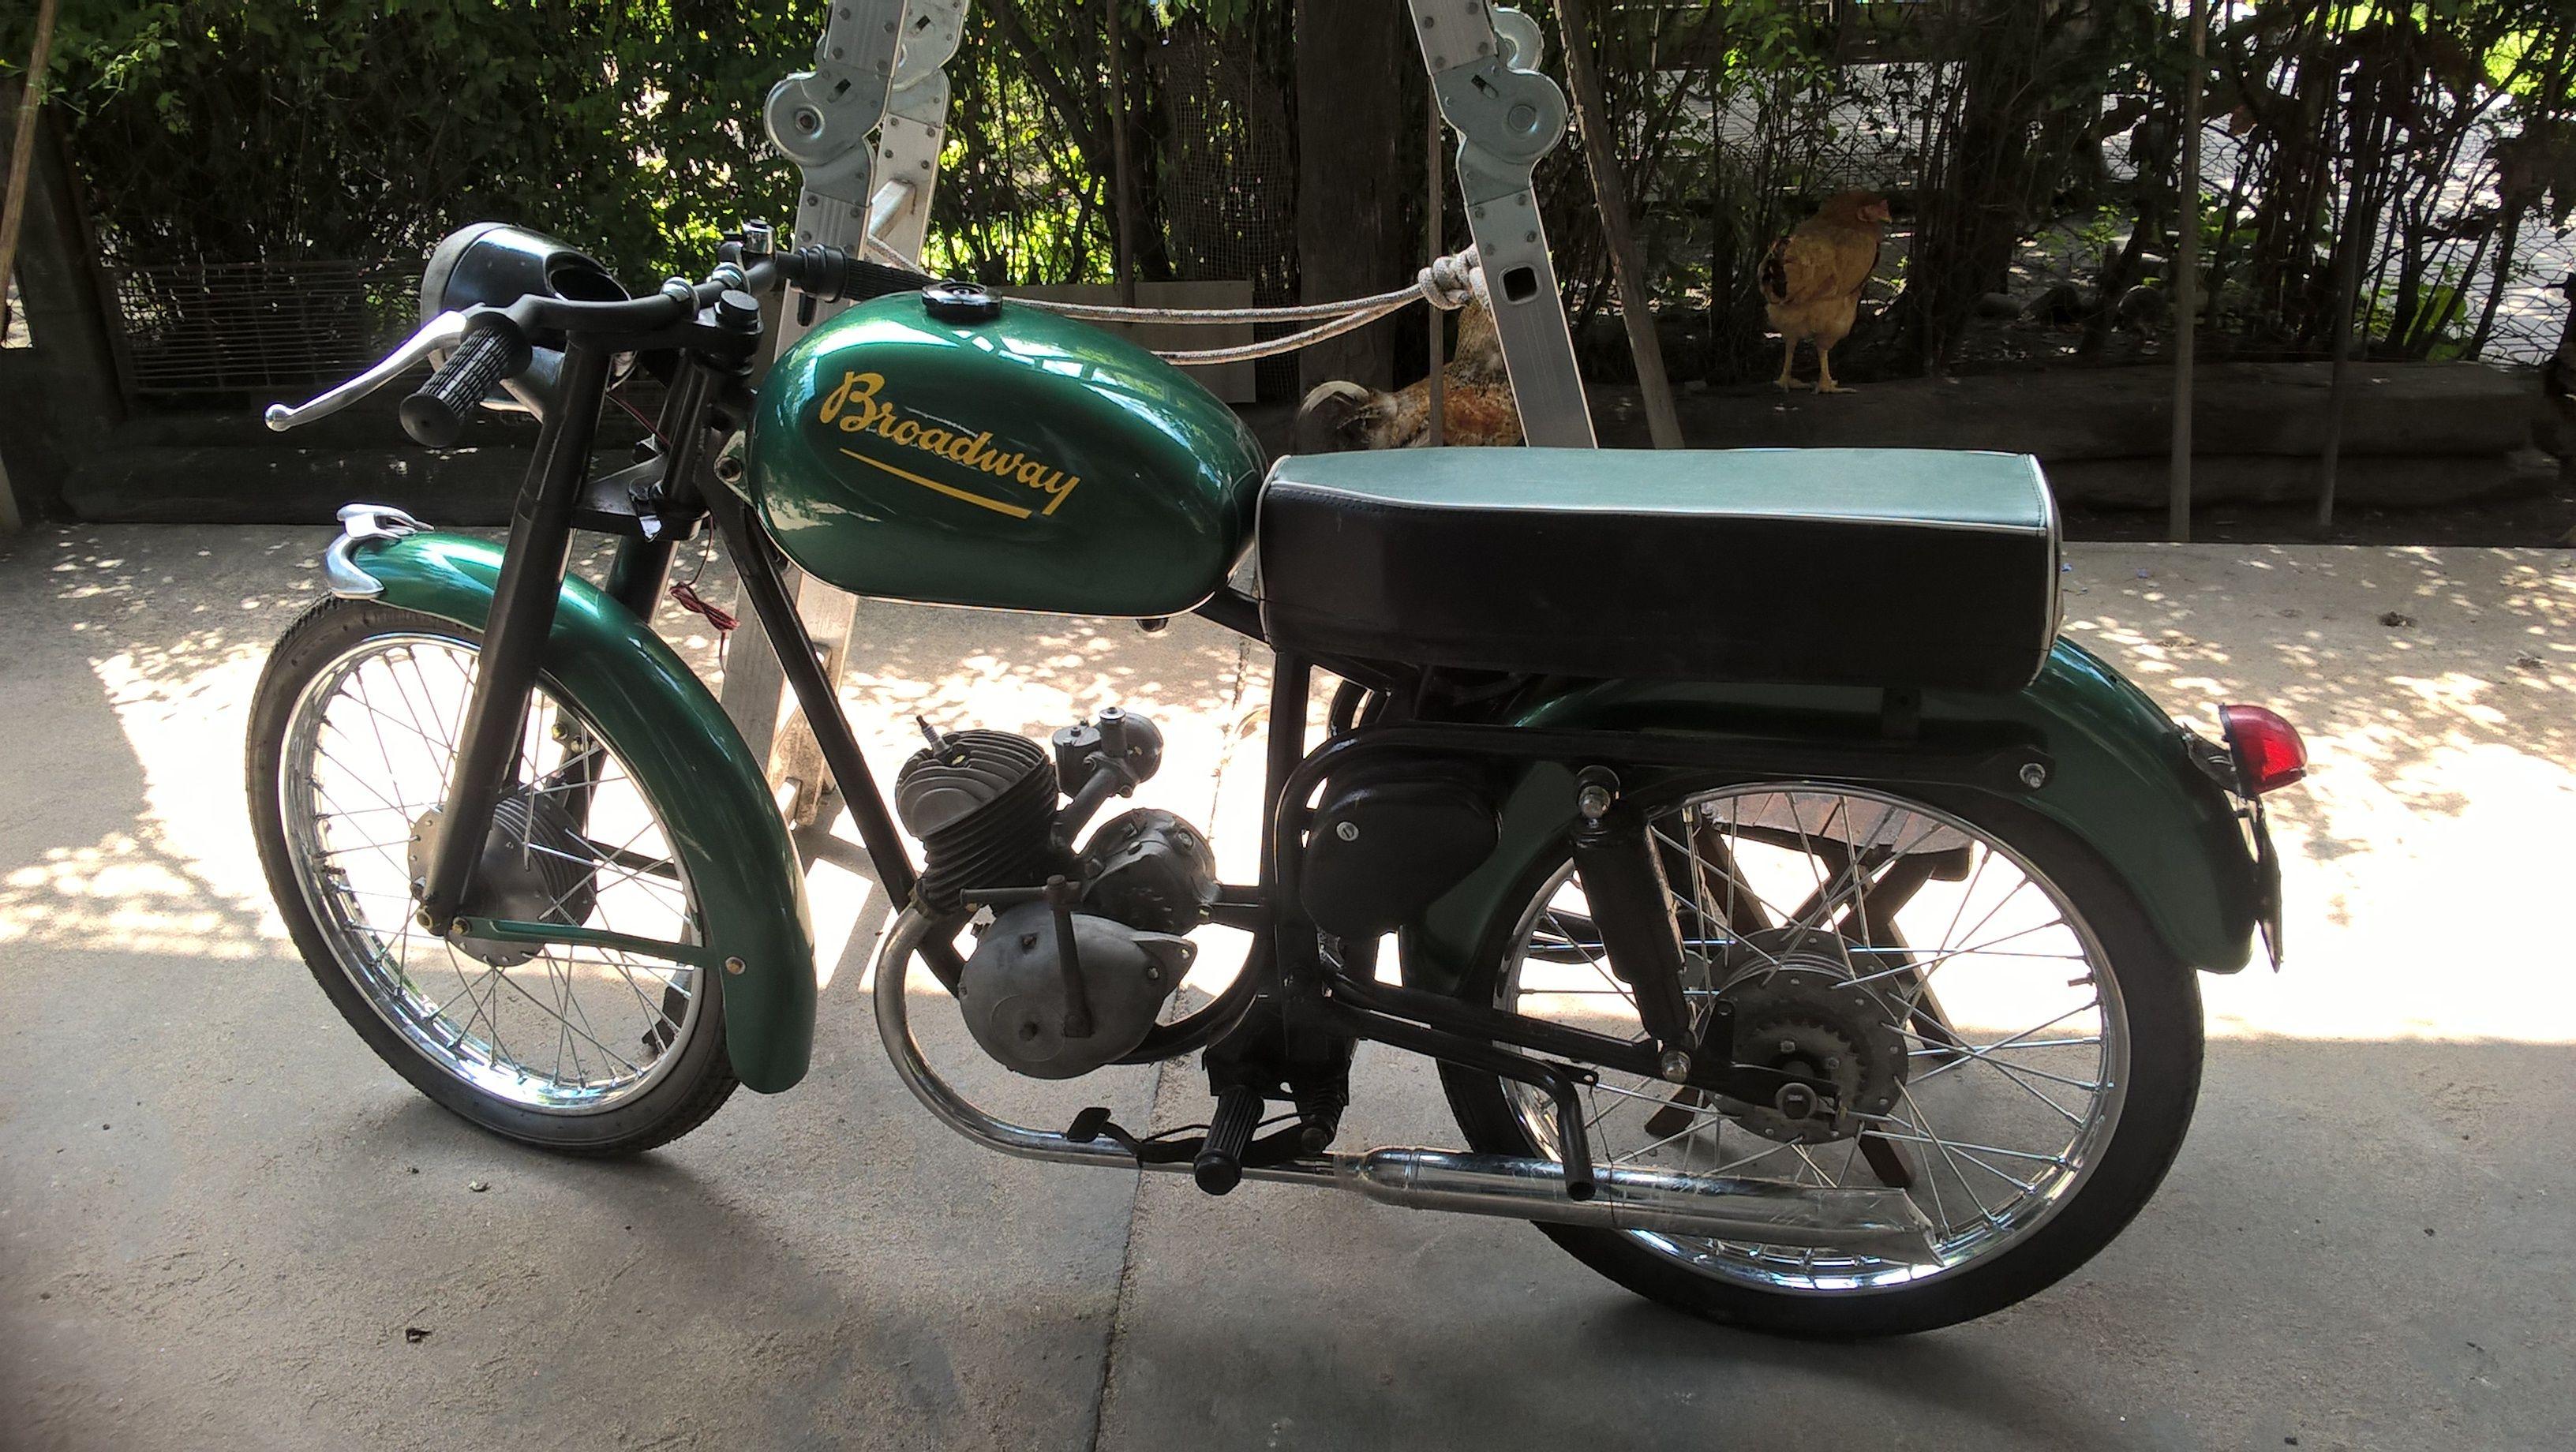 moto broadway original con asiento enterizo